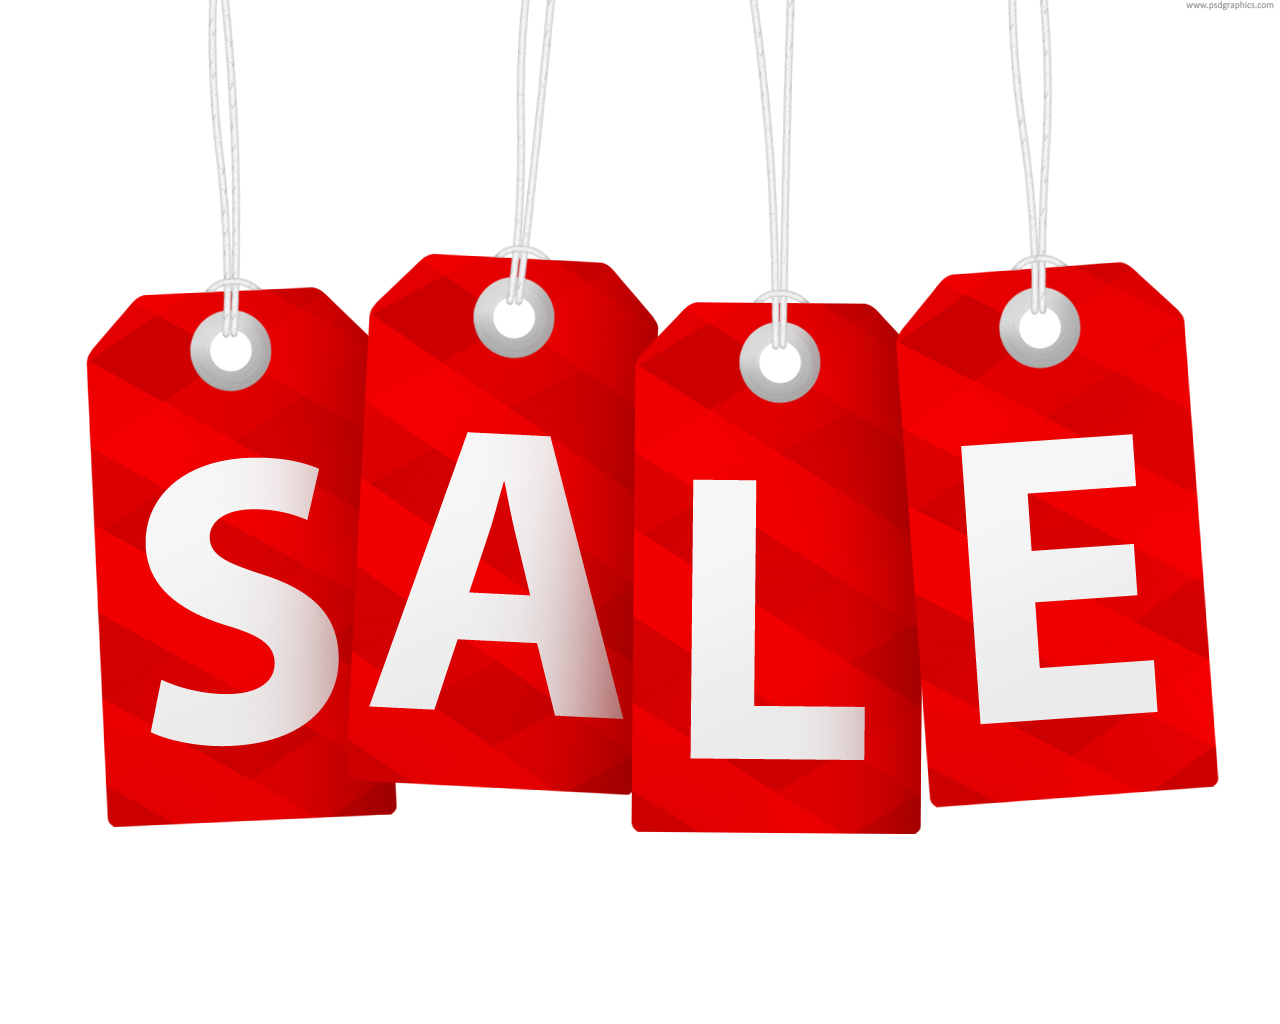 tag-sale-160279.jpg